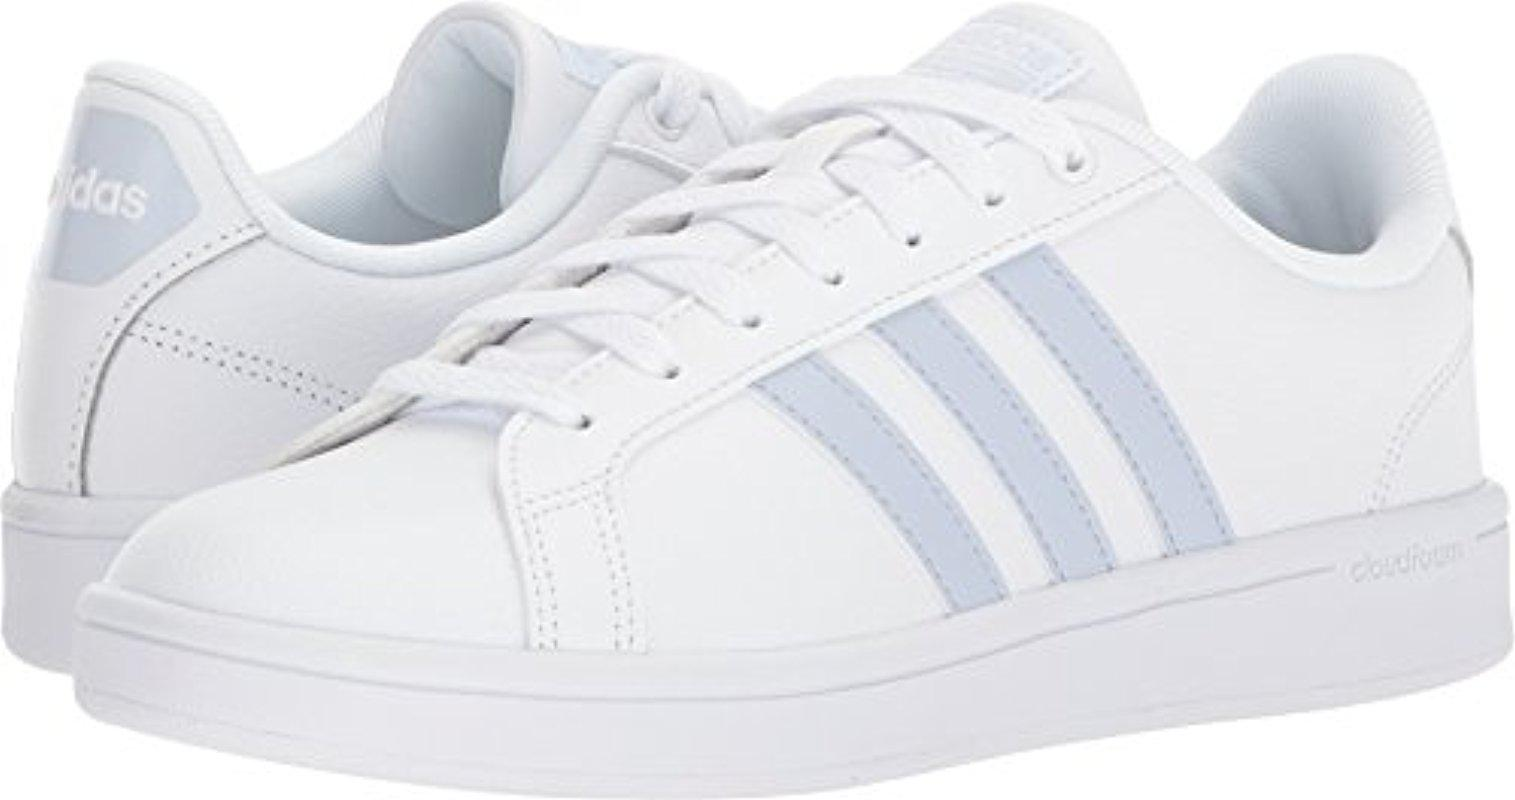 lyst adidas cloudfoam vantaggio striscia bianco / bianco / aero blue 10 b